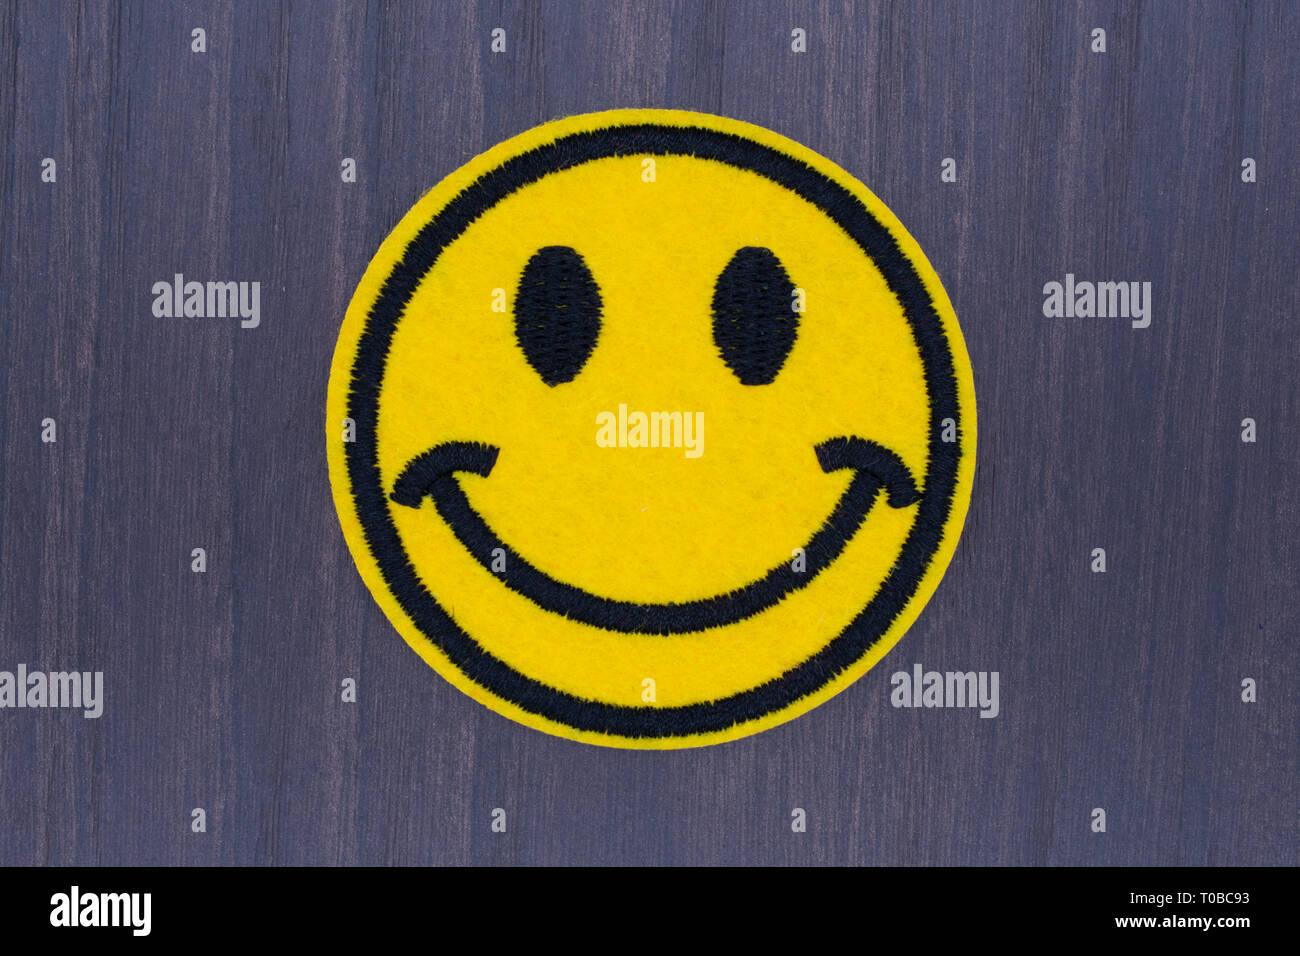 Smile Emoji Avatar Faces / Smiley Happy Yellow Sun Face